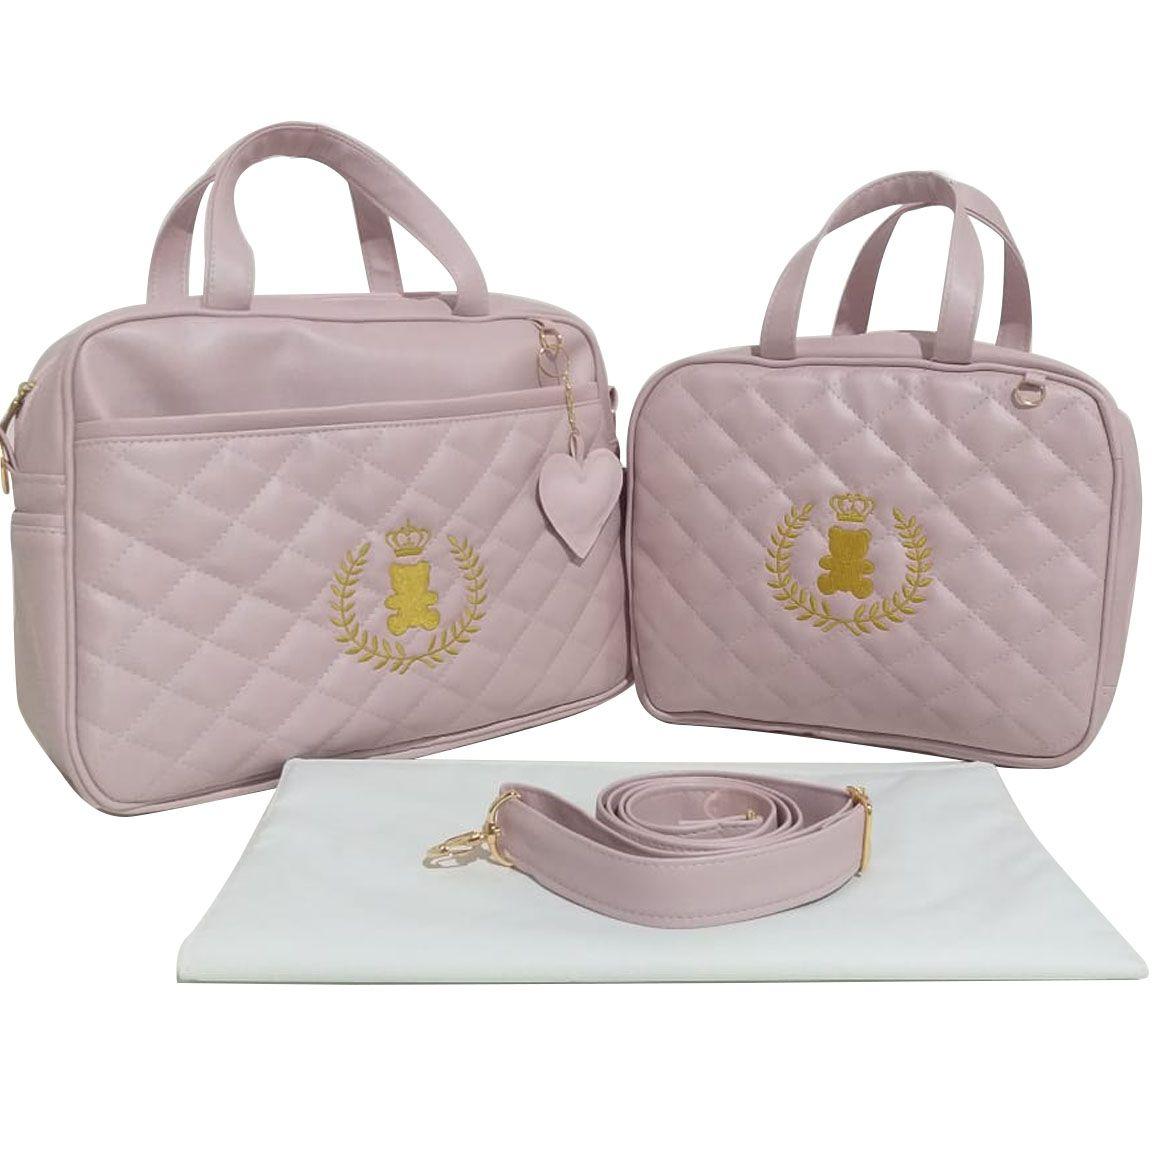 Kit Bolsa Maternidade Luxo Matelassê Rosa - 3 Peças